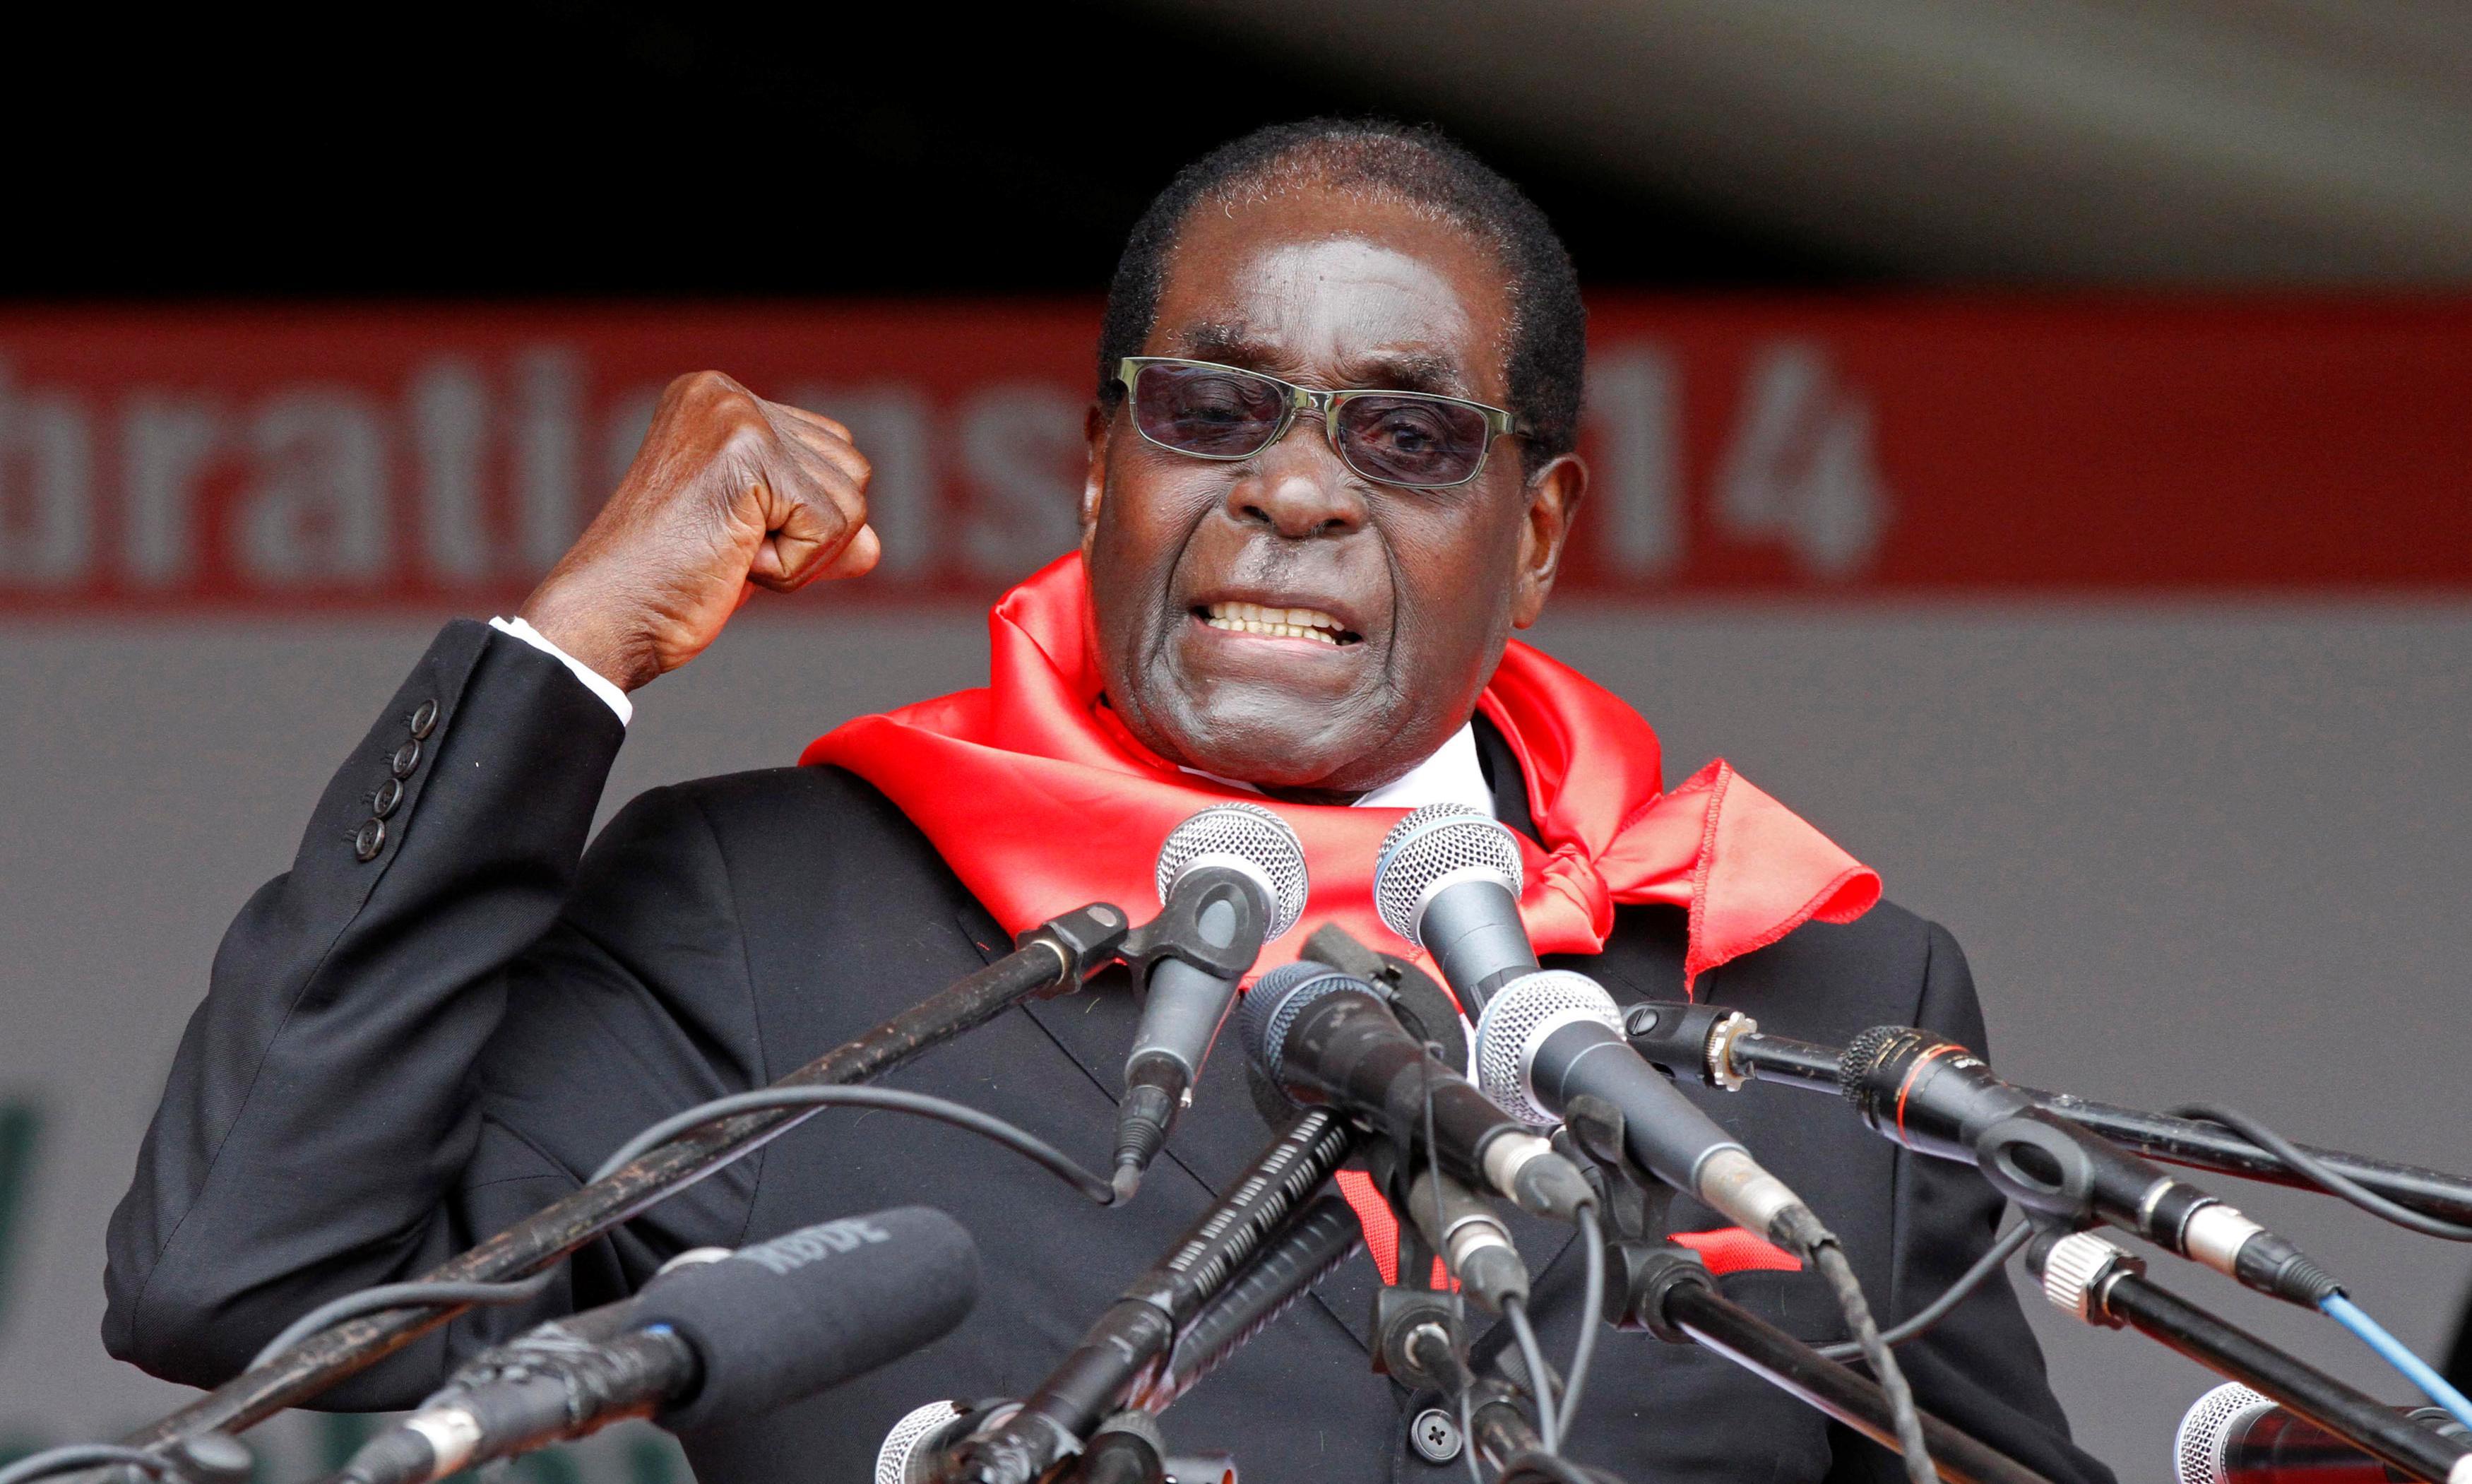 Friday briefing: Robert Mugabe dies aged 95